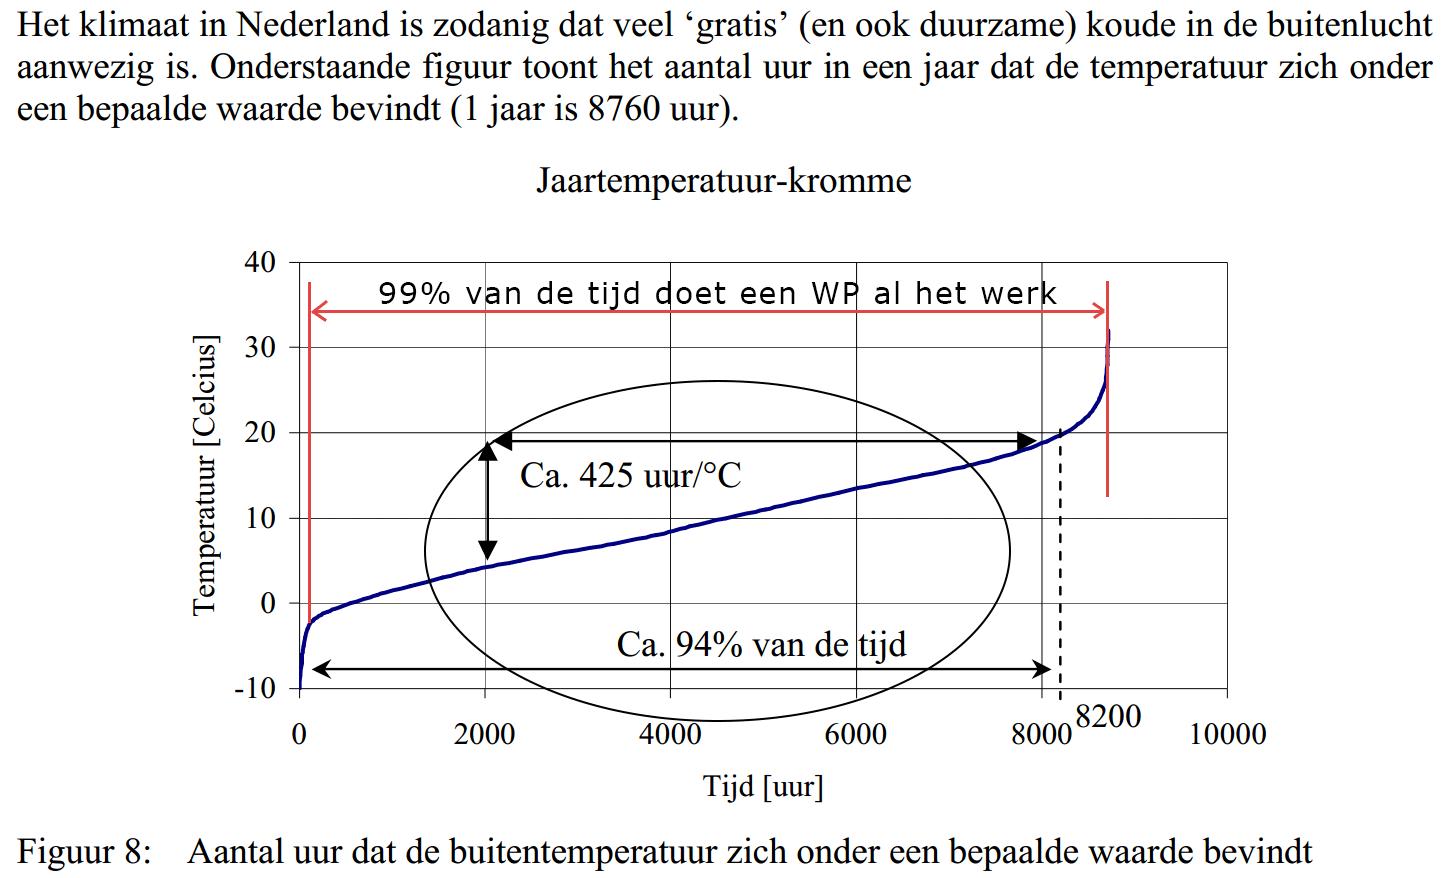 http://img.warmtecheck.nl/WP-bereik-weer.png